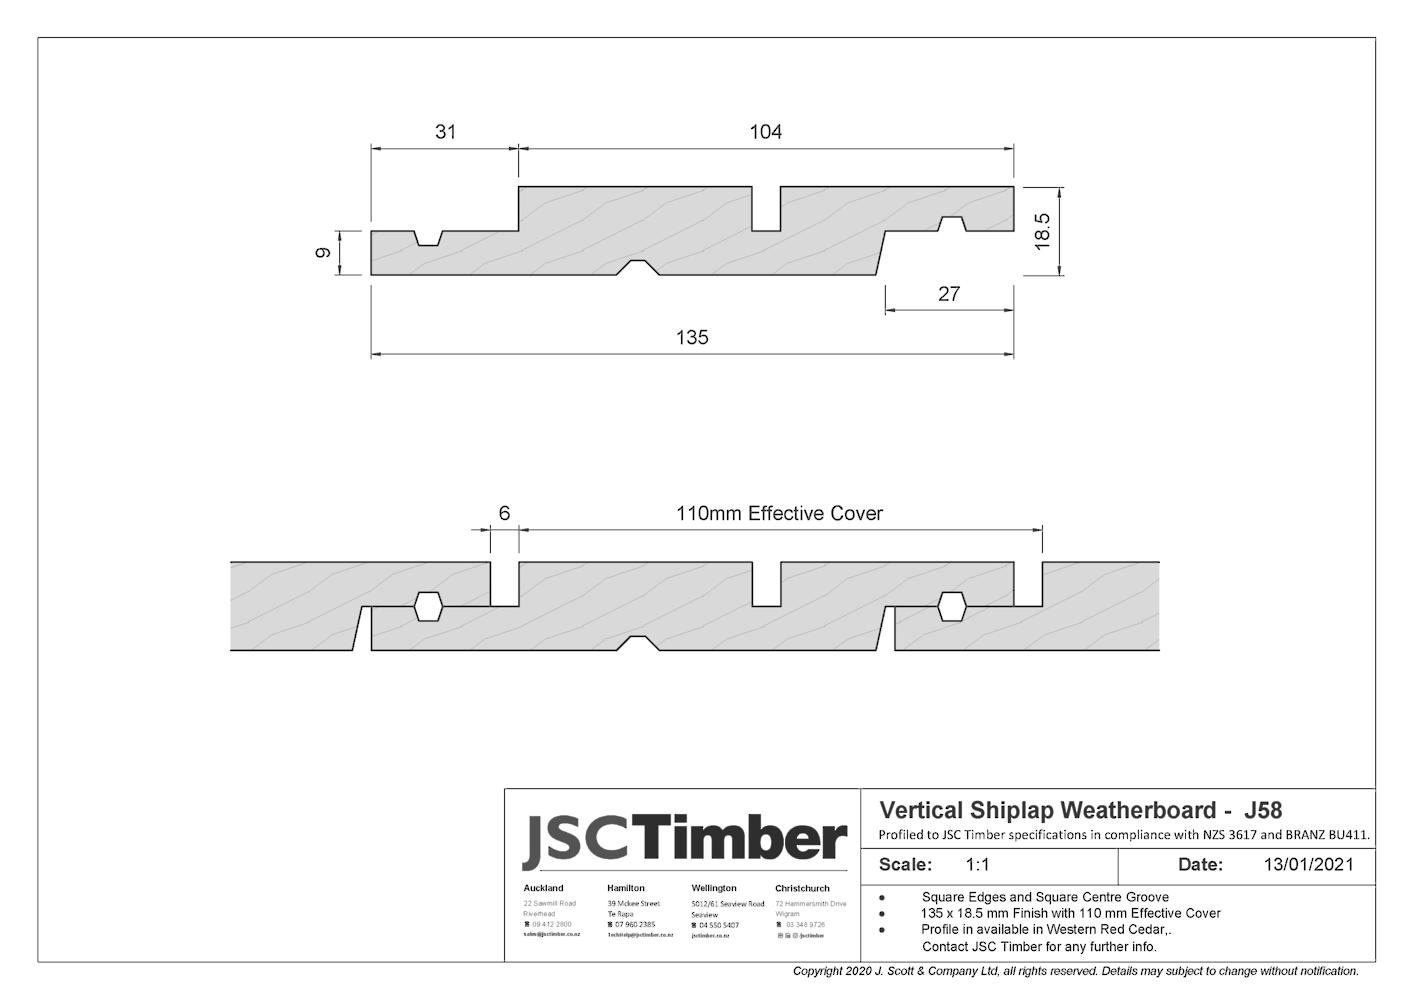 J58 Vertical Shiplap Weatherboard